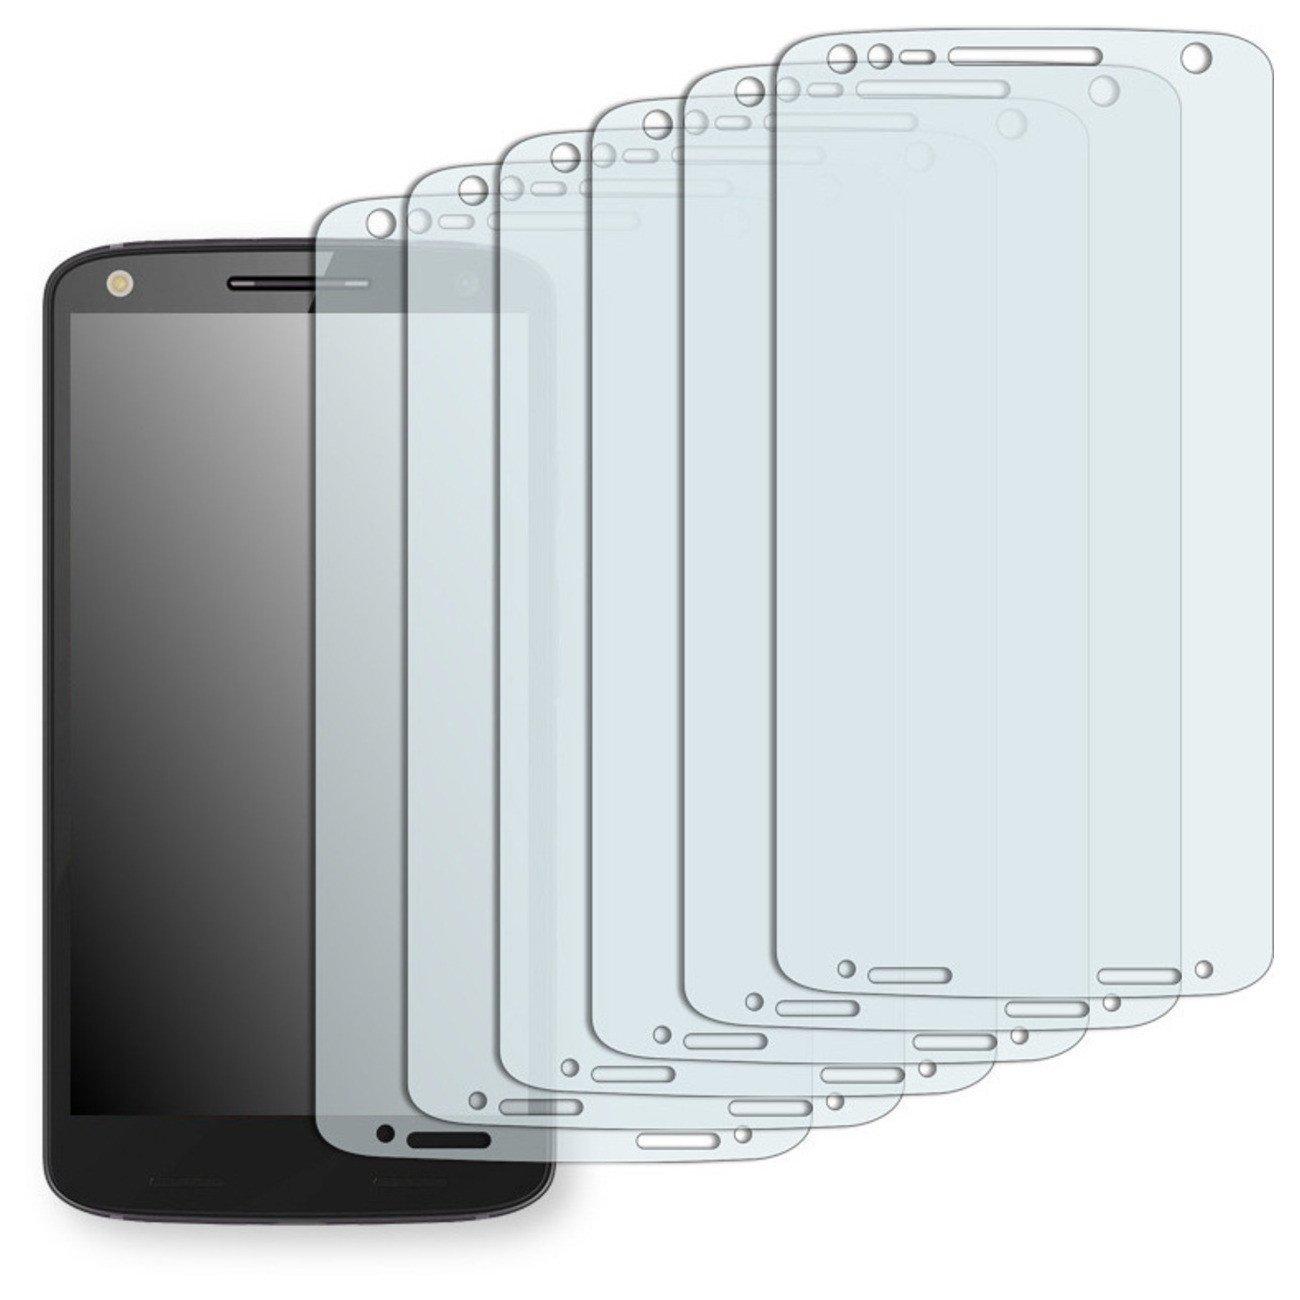 6x Golebo Anti-Glare screen protector for Motorola Moto X Force (Anti-Reflex, Air pocket free application, Easy to remove)